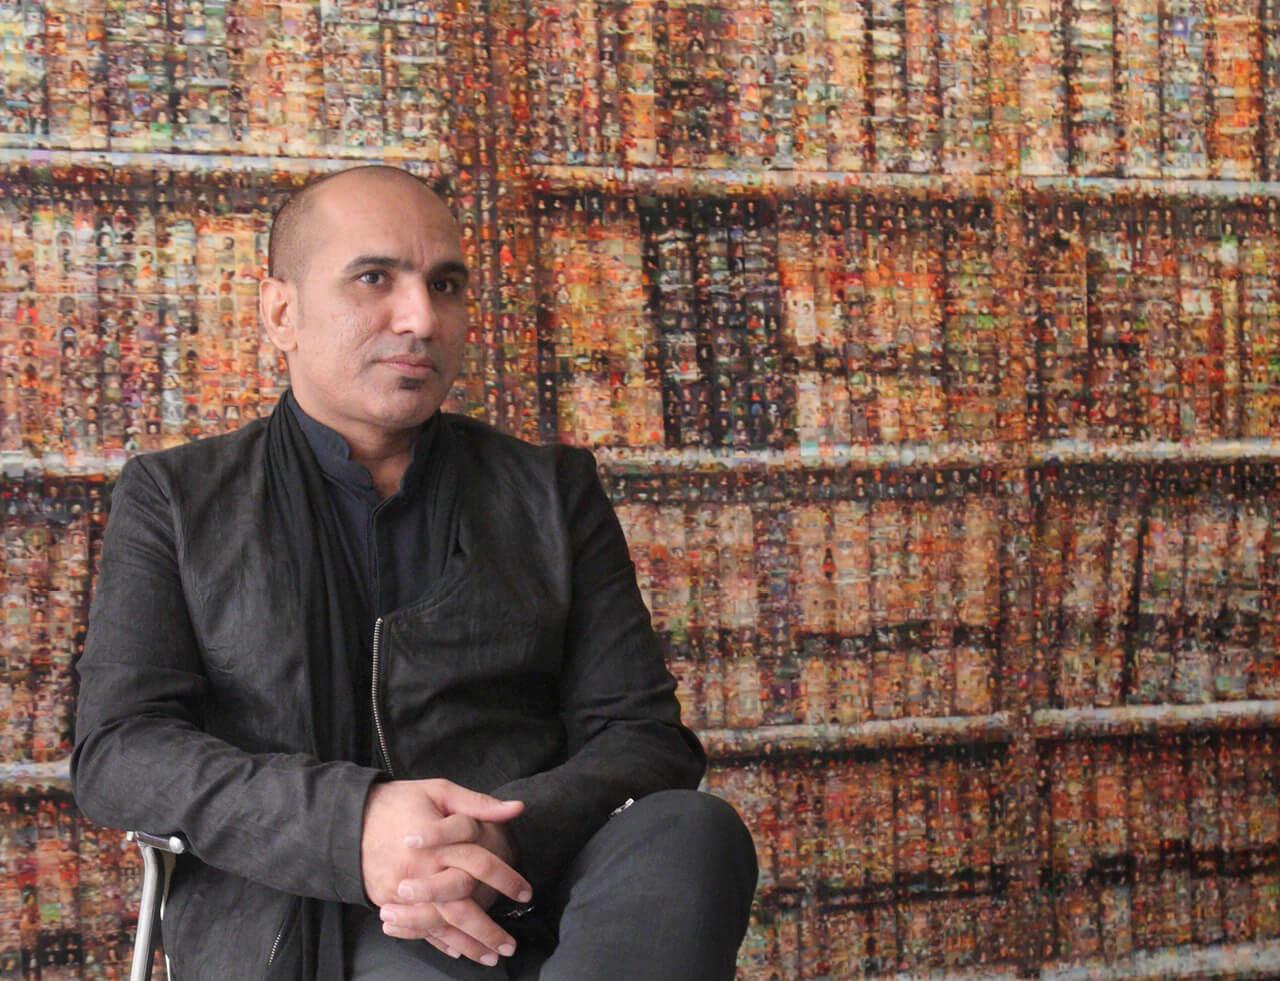 Rashid Rana to represent Pakistan at Venice Biennale